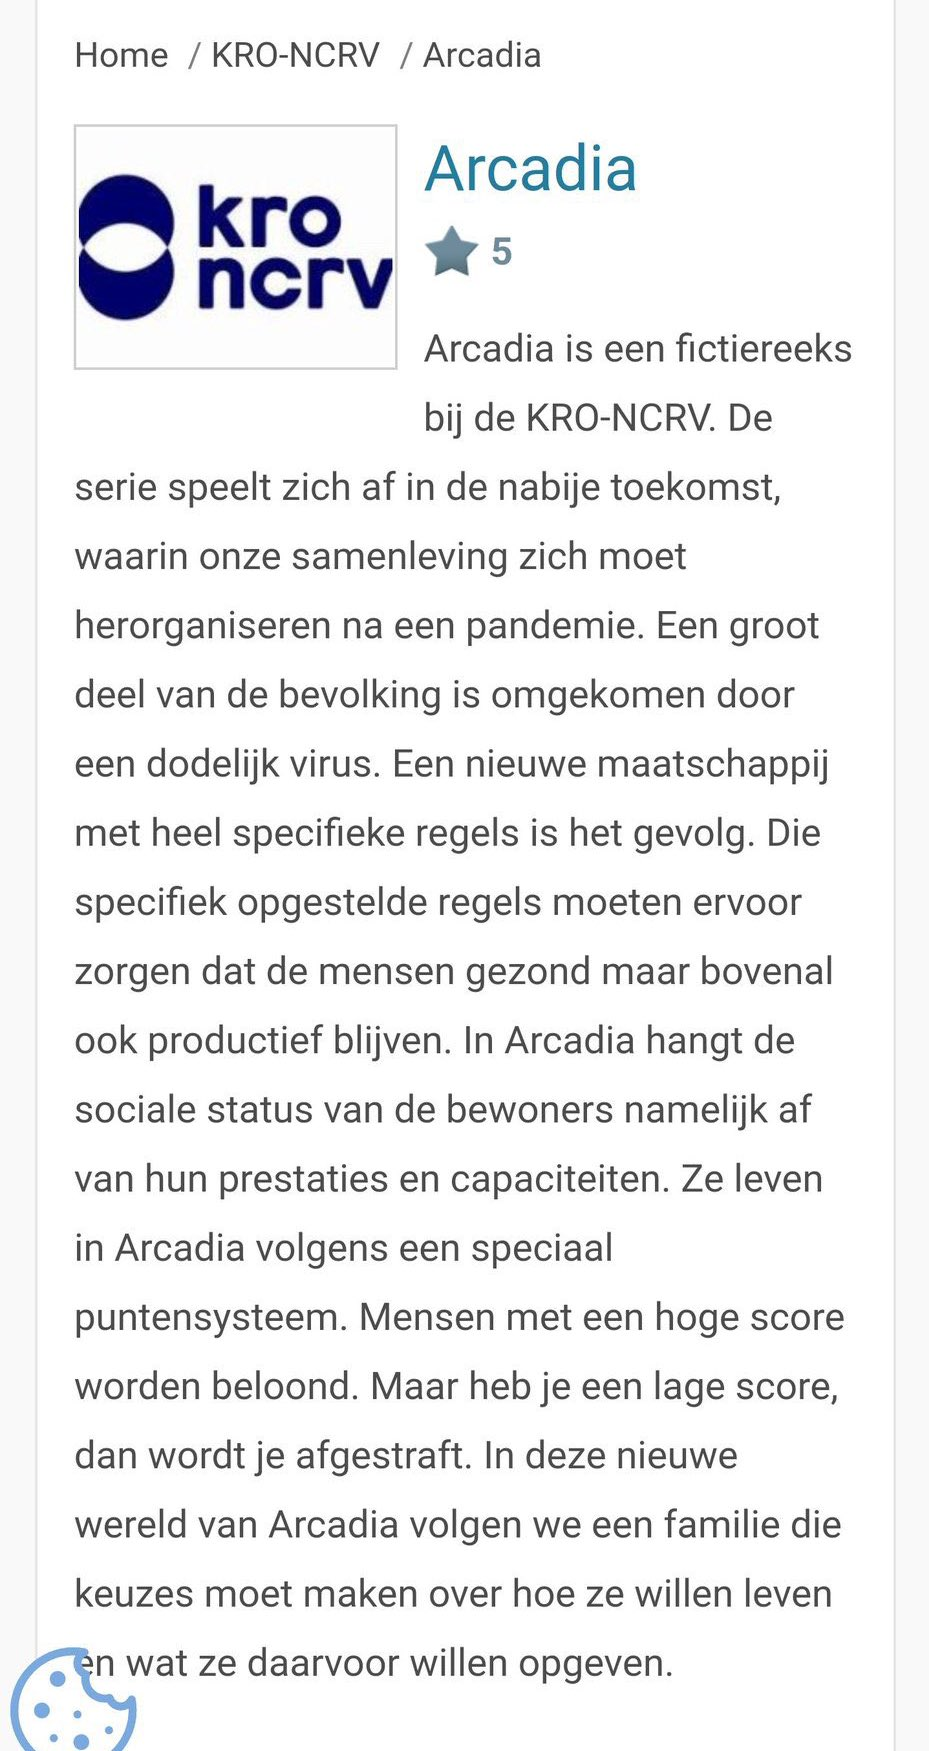 https://www.martinvrijland.nl/wp-content/uploads/2021/10/FBj498PX0AIgDlF.jpeg